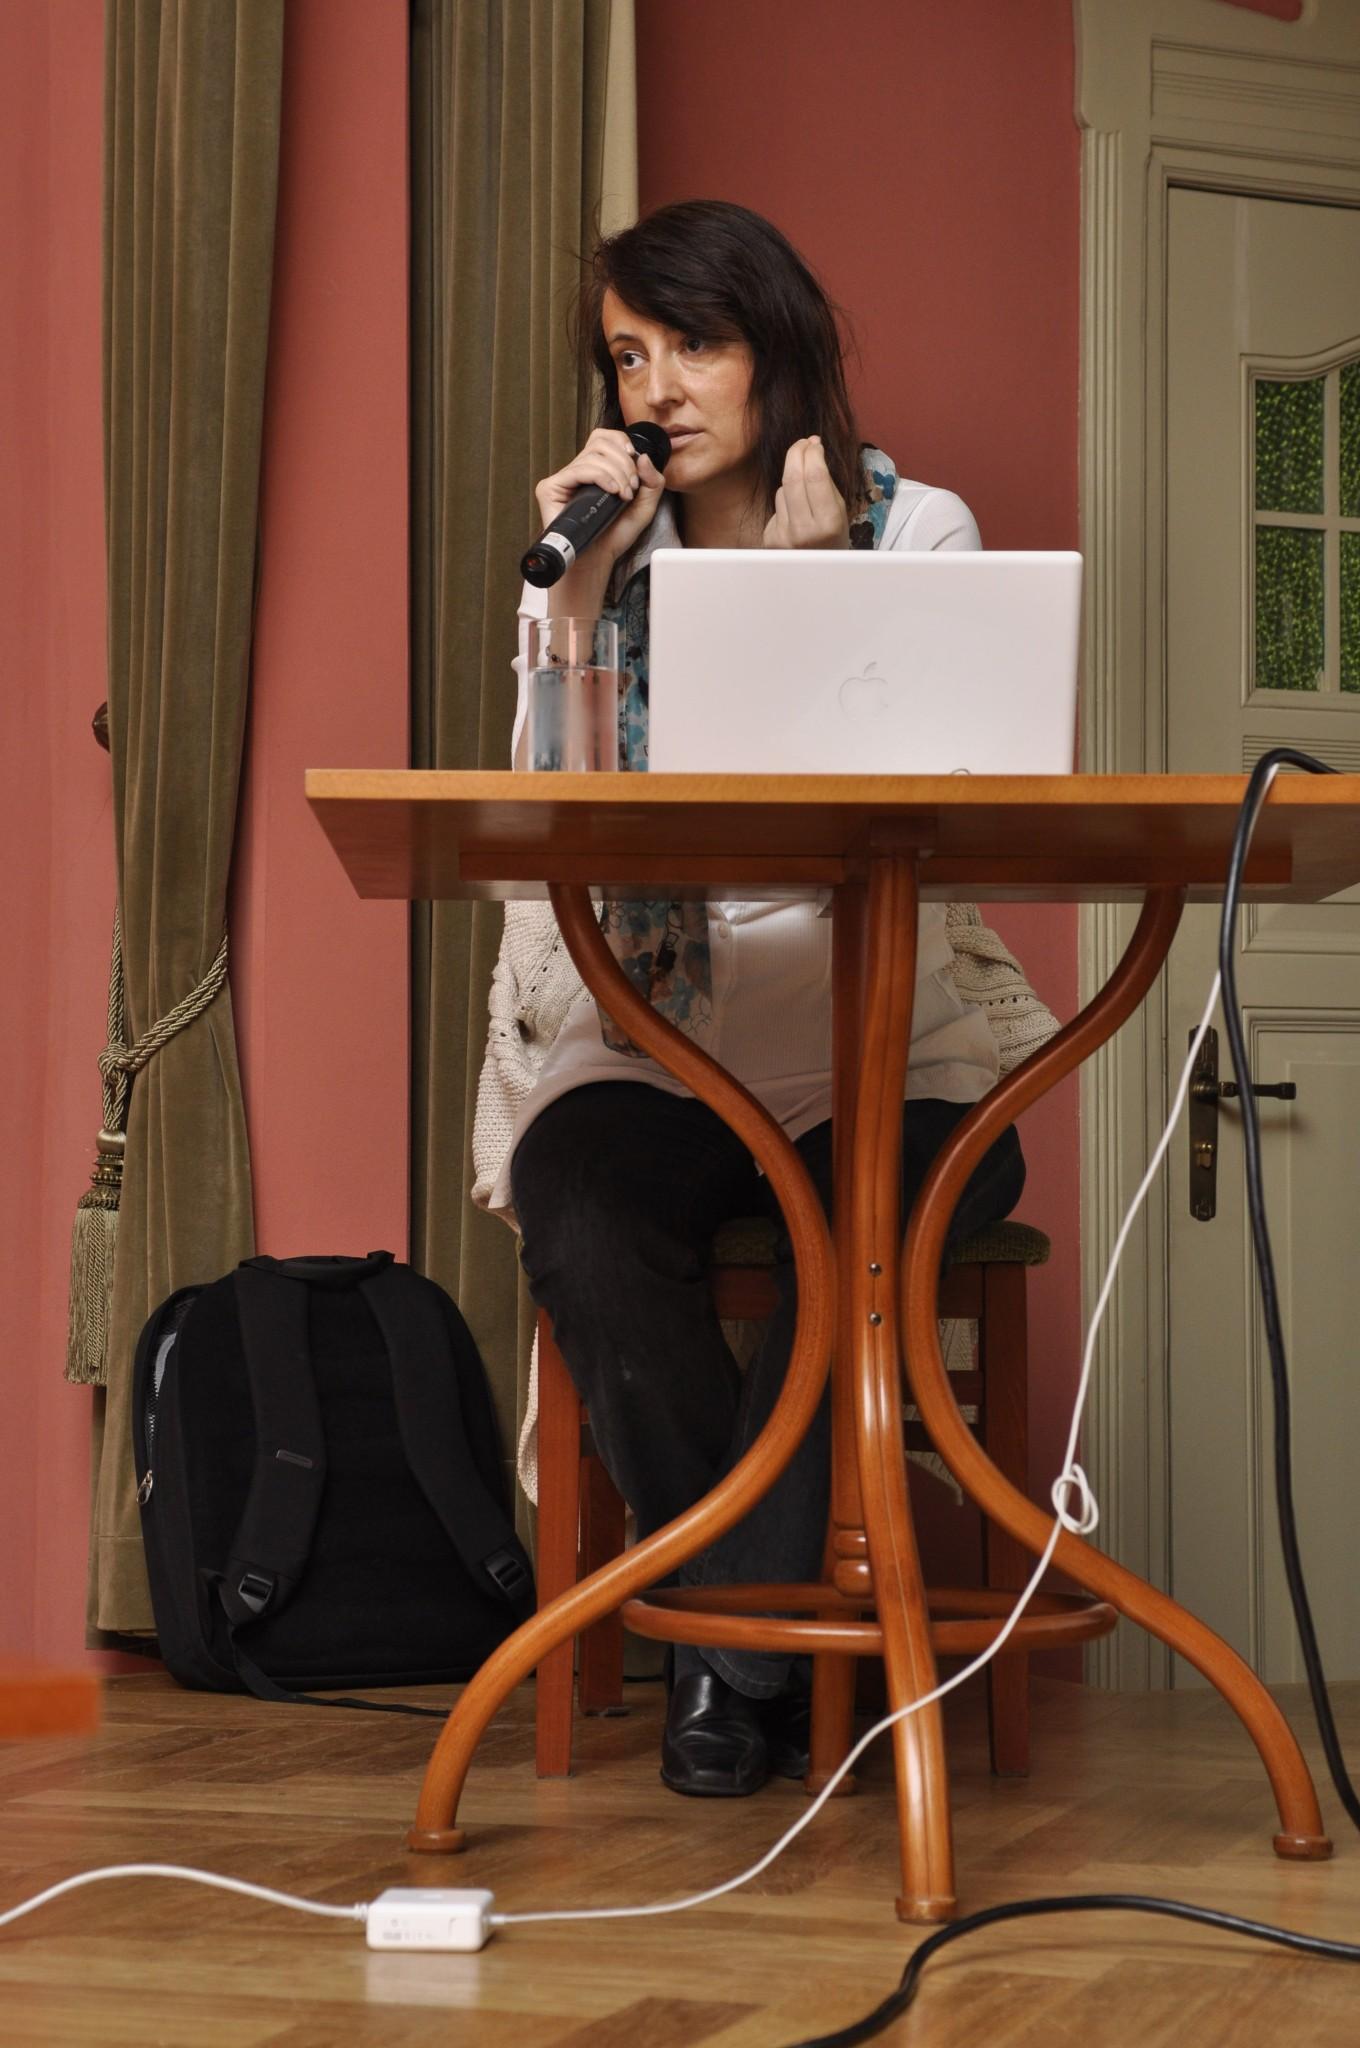 Fotomotif Festival 2010